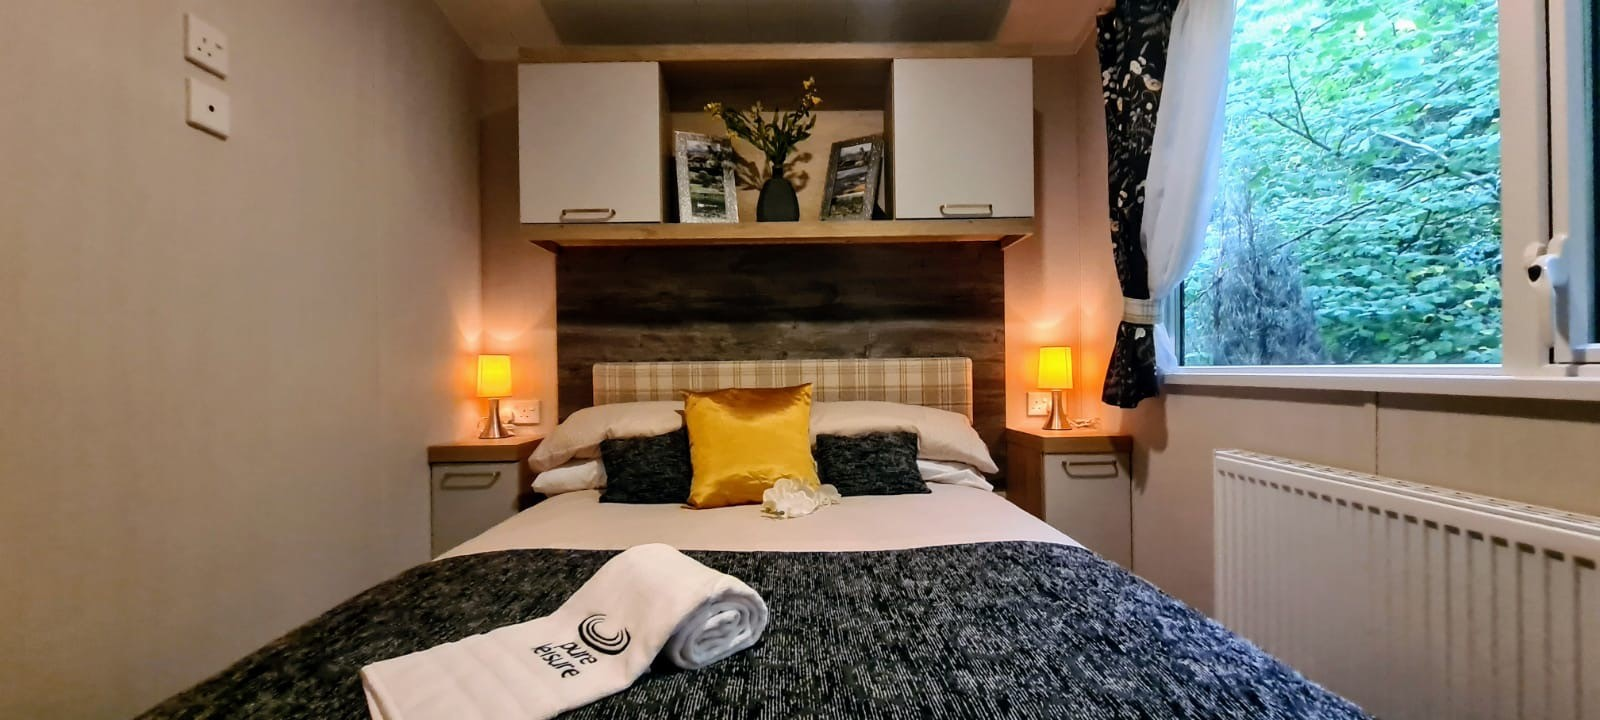 Chic Double Bedroom